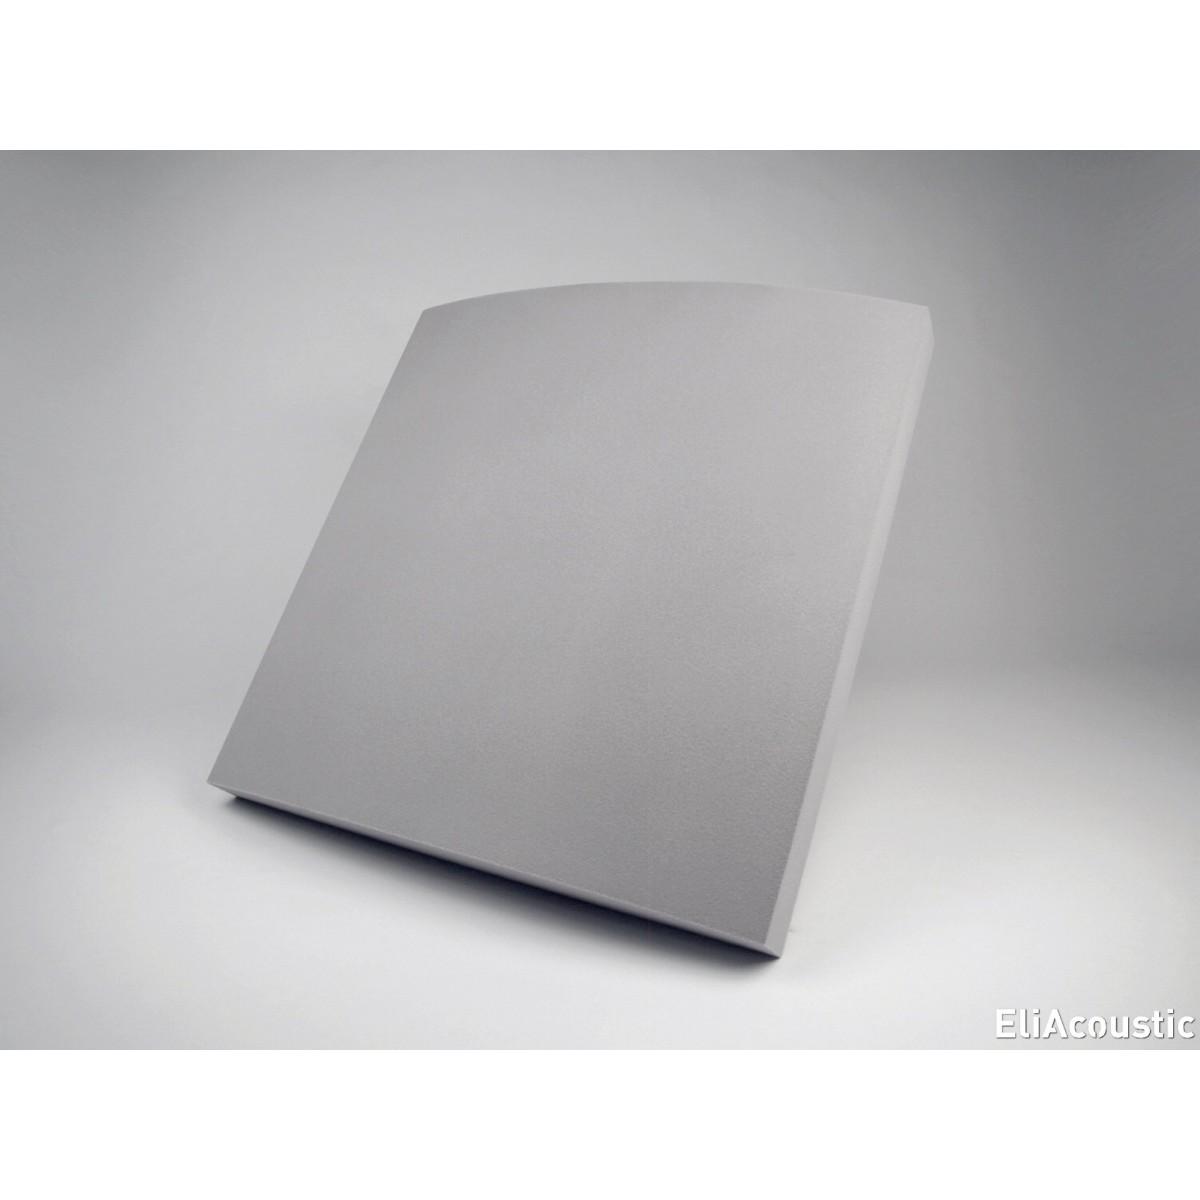 EliAcoustic Curve 60 Premiere LightGrey (Ref 146). Panel acustico decorativo